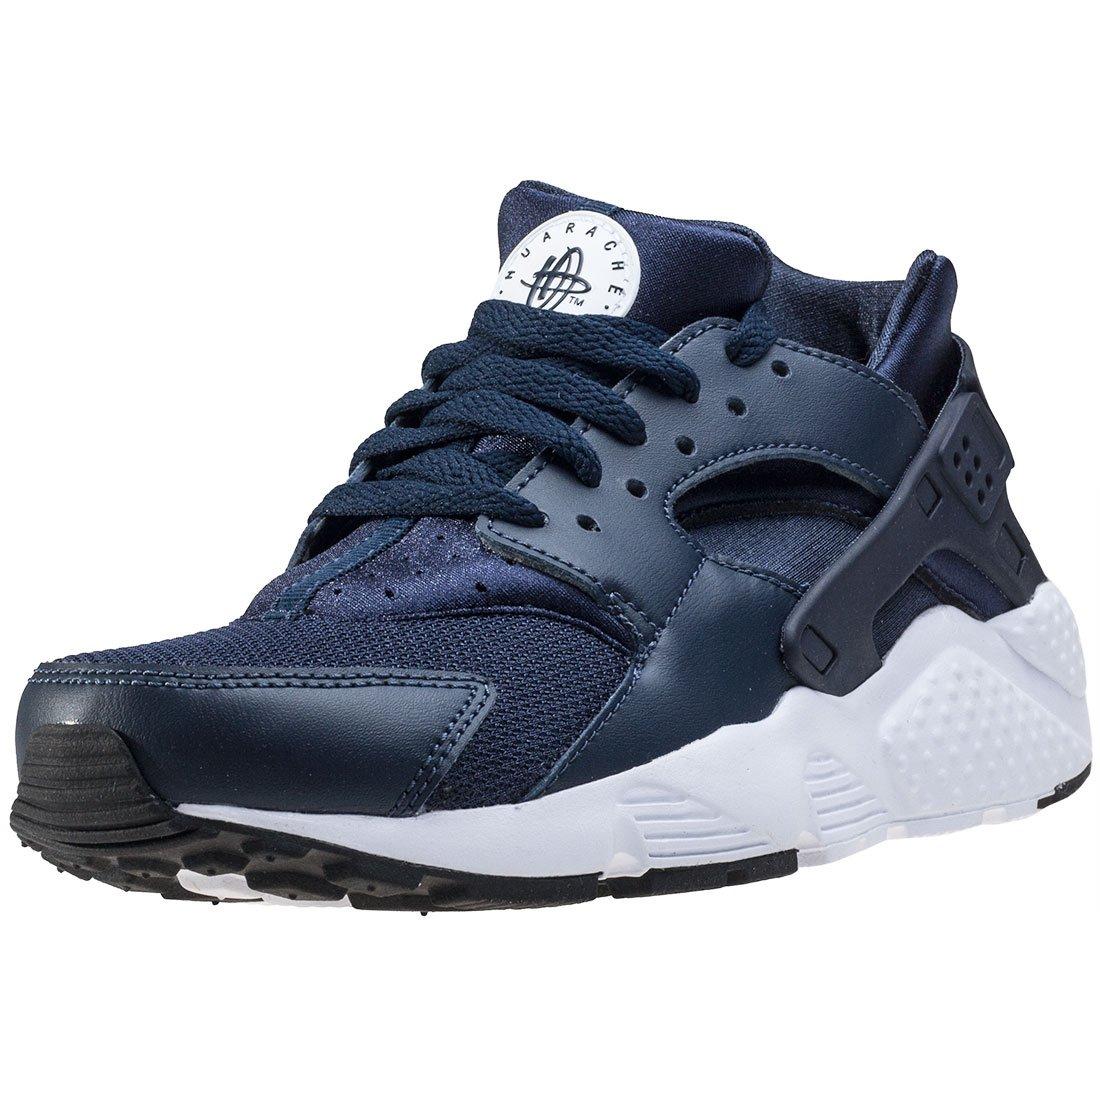 quality design cbe8e 8692c Nike Huarache Run Kids Trainers Obsidian - 3 UK